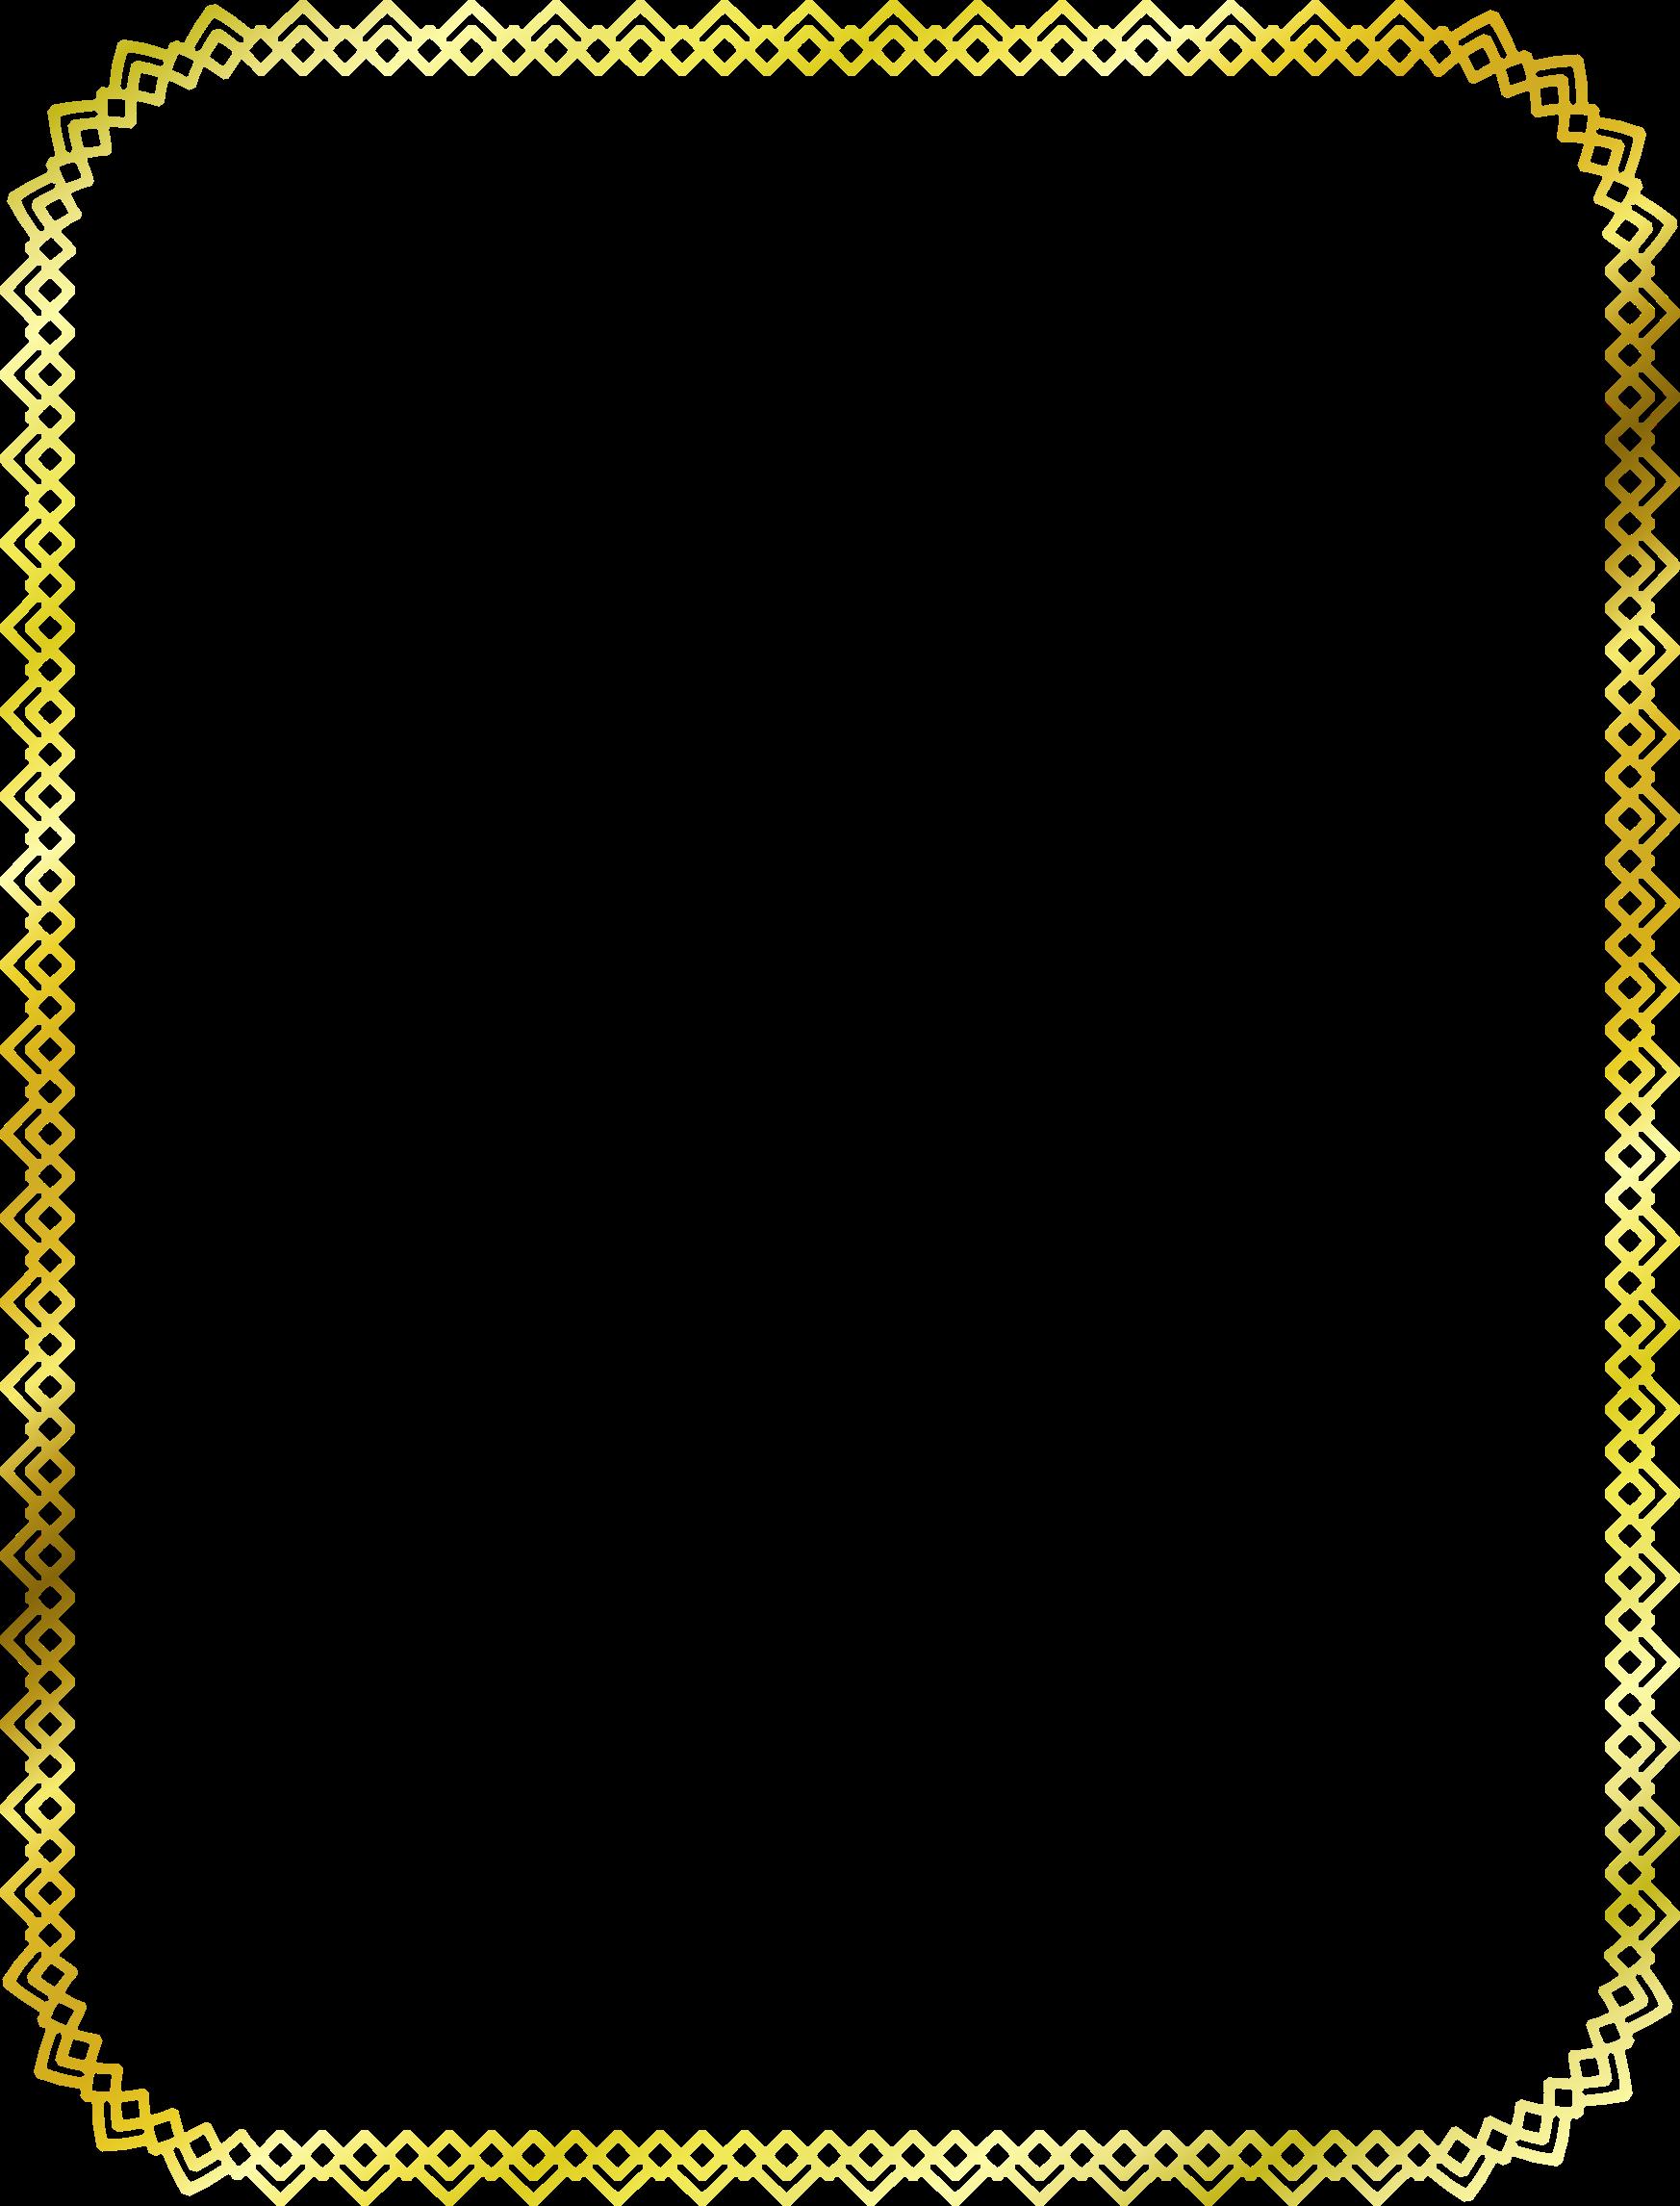 clip art Quadrilateral border big image. Borders clipart diamond